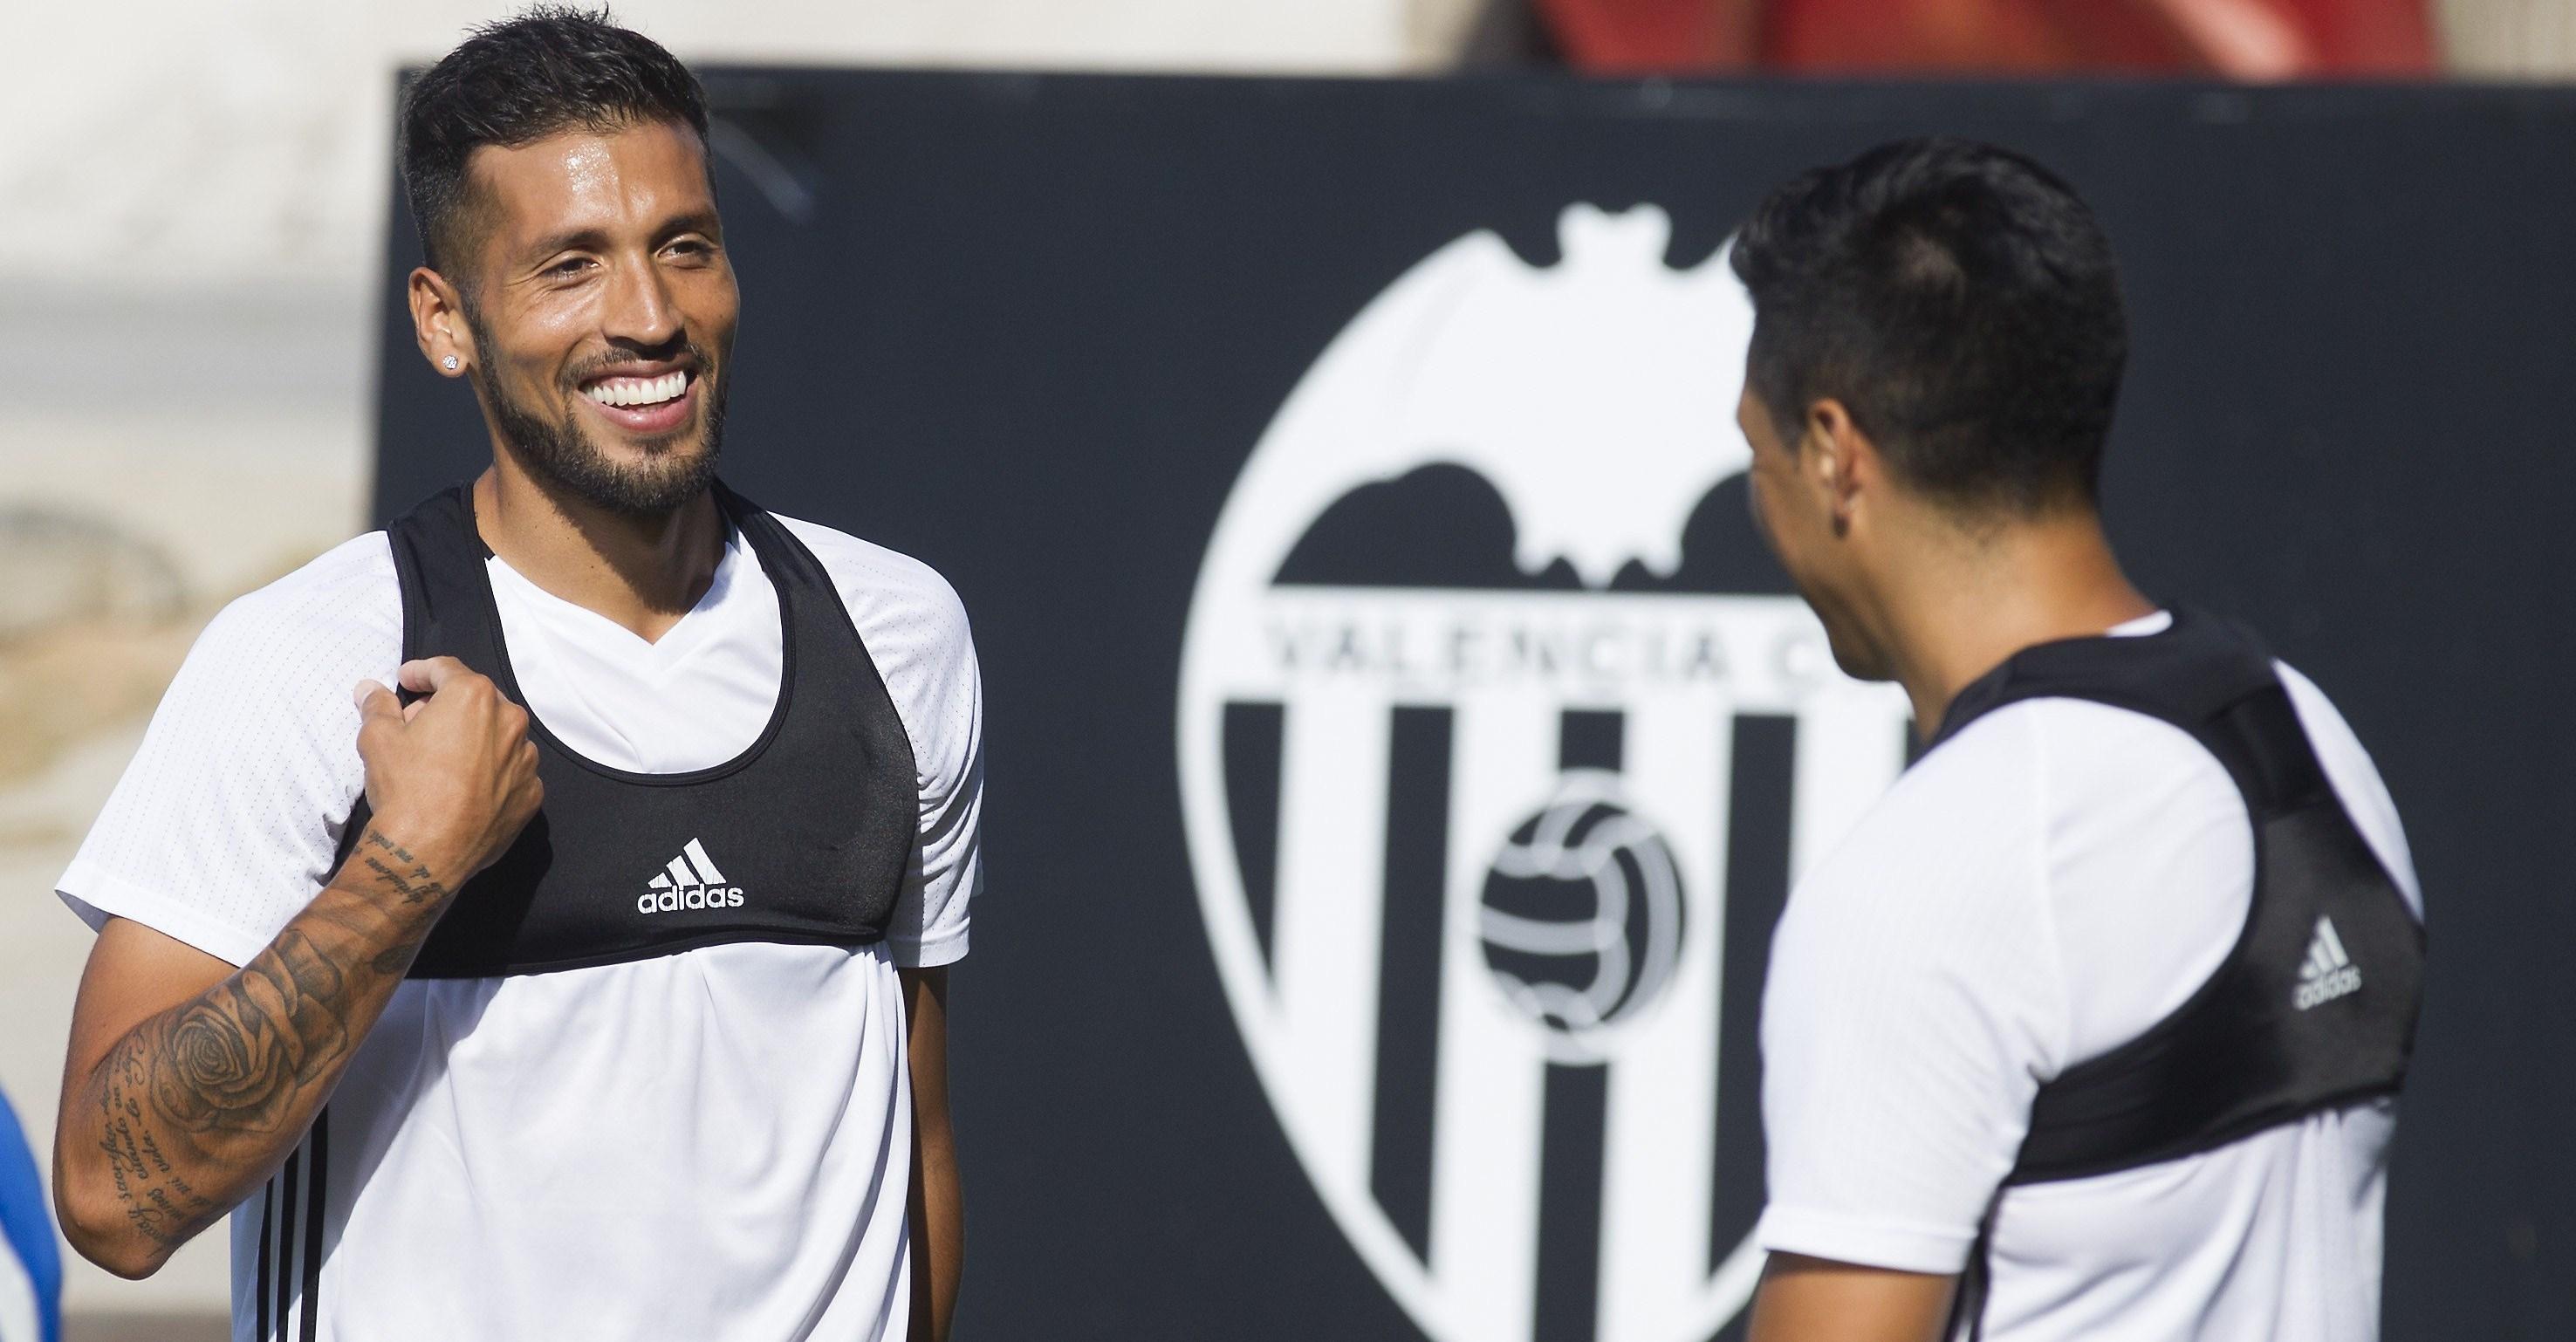 Защитник Валенсии нужен Интеру и Челси